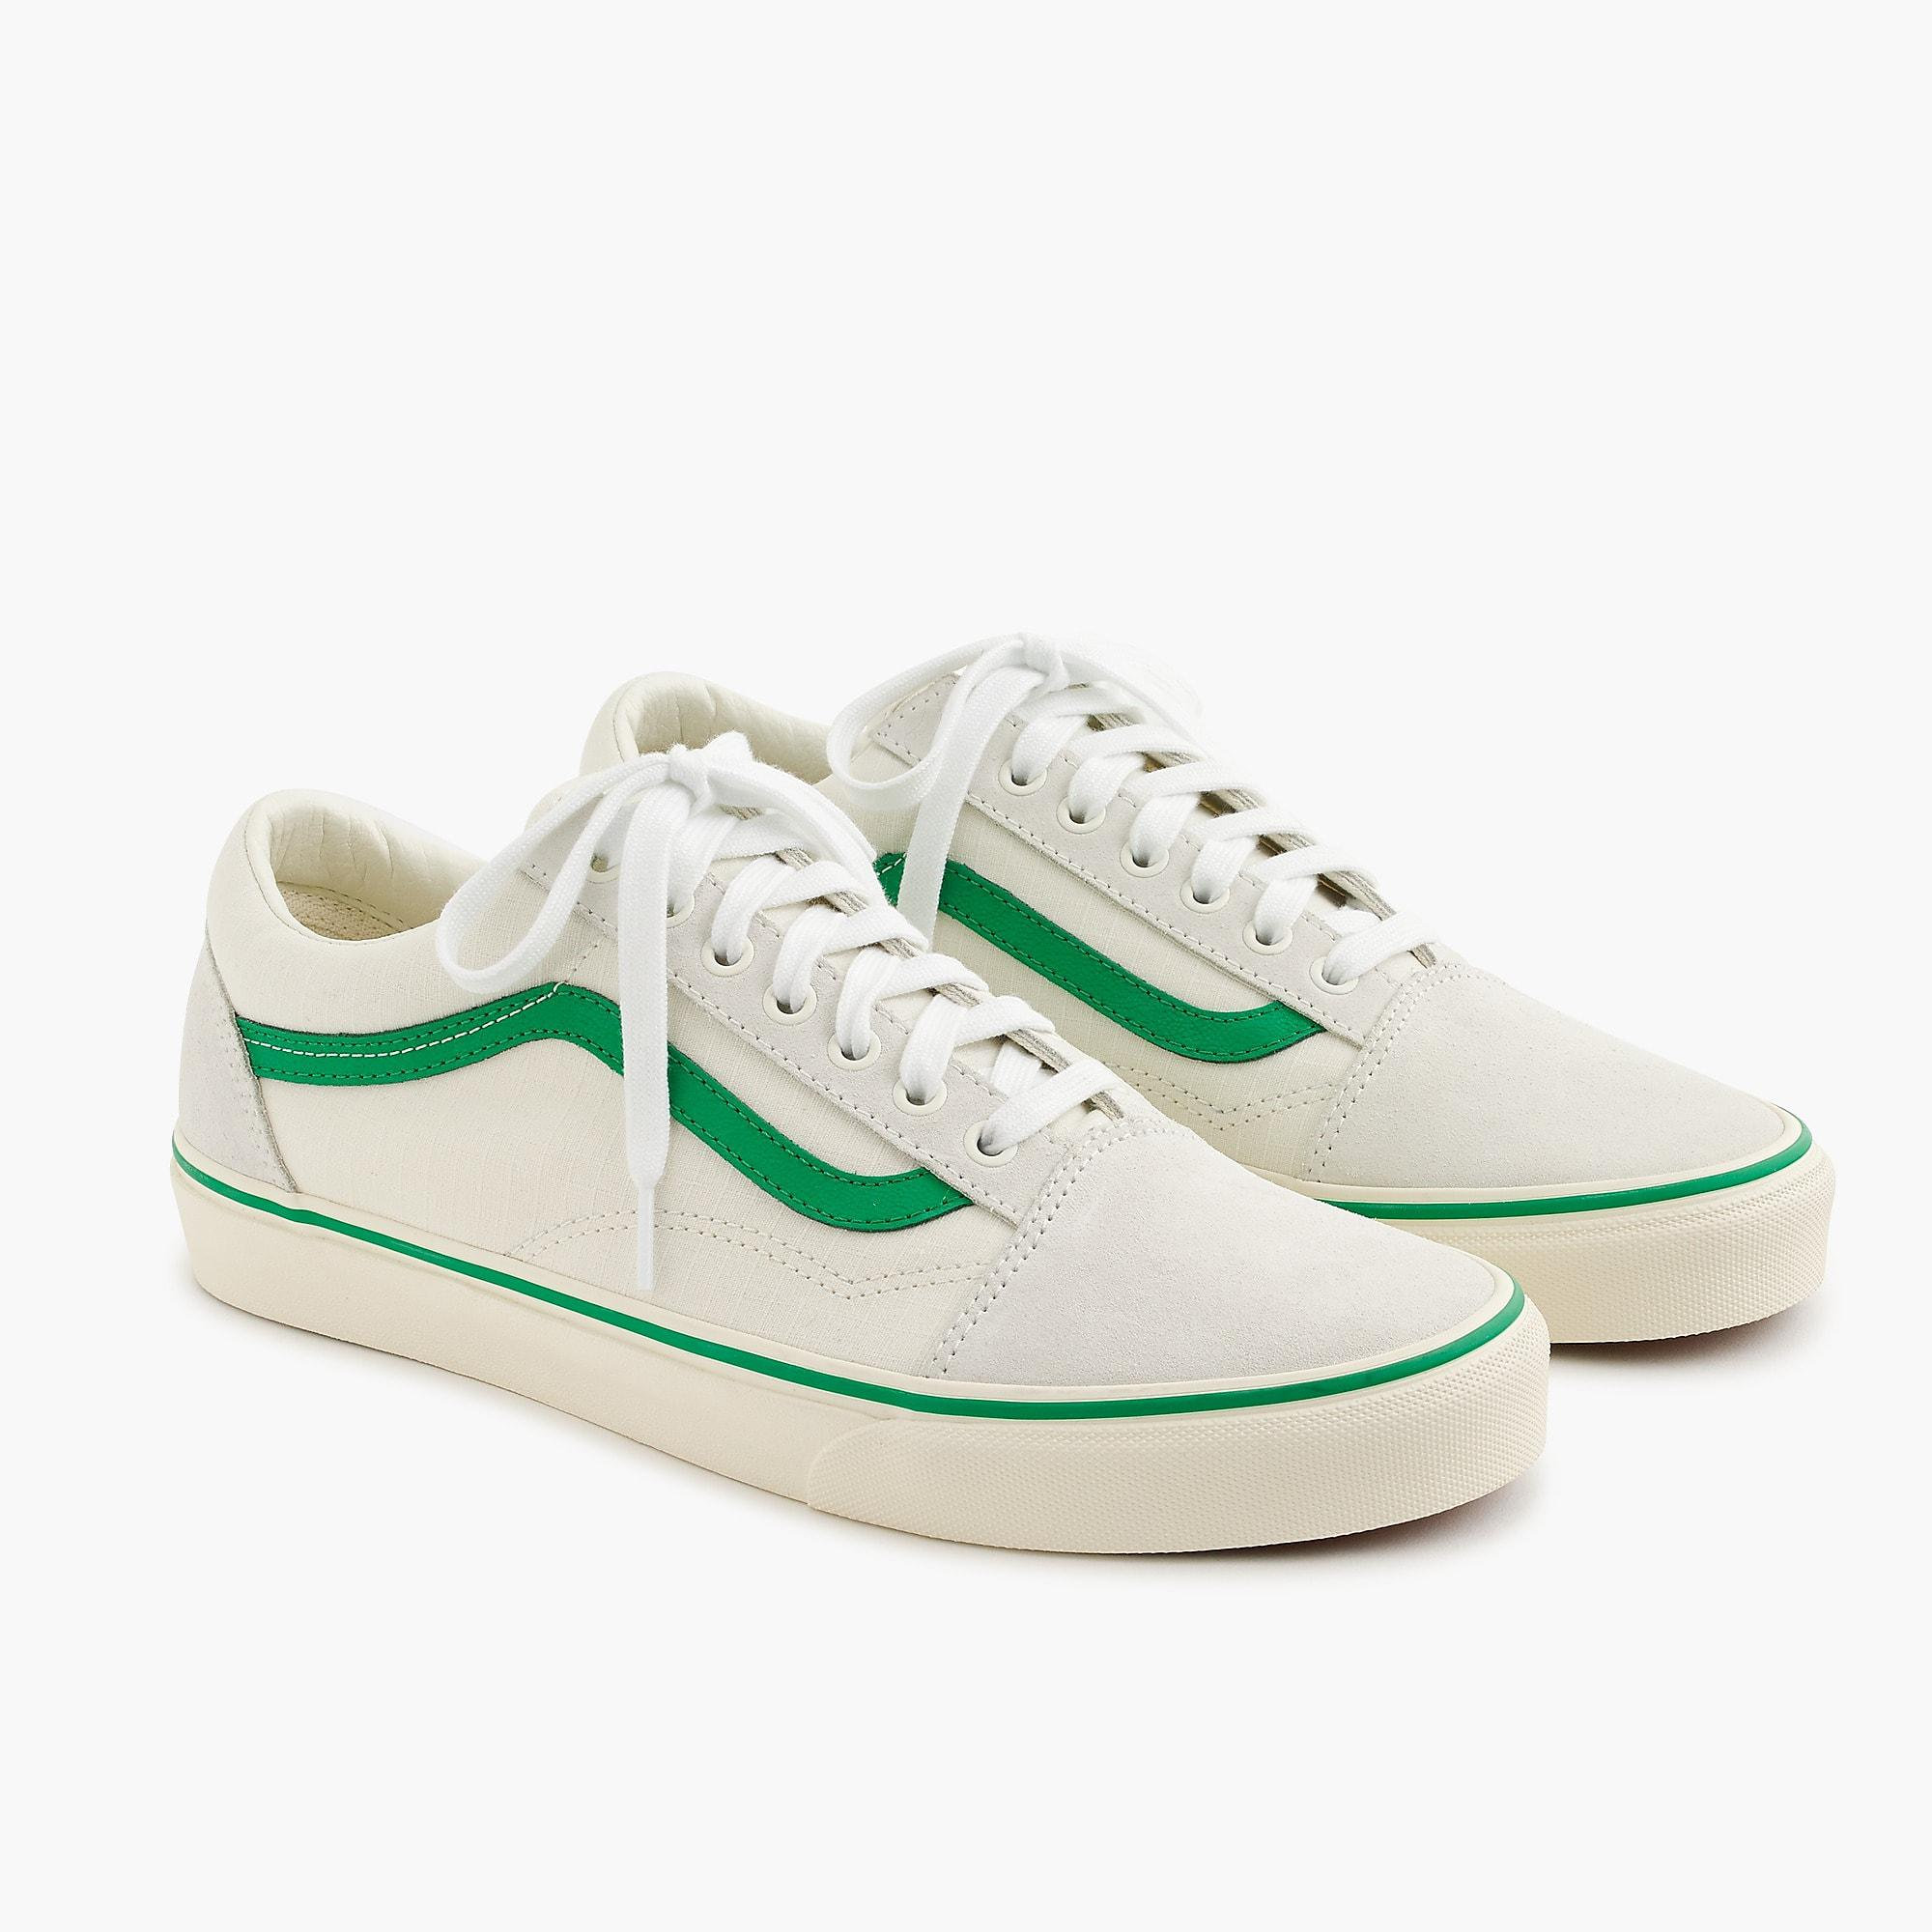 14f03764ab Vans - Green Old Skool Sneakers In Ripstop Cotton for Men - Lyst. View  fullscreen